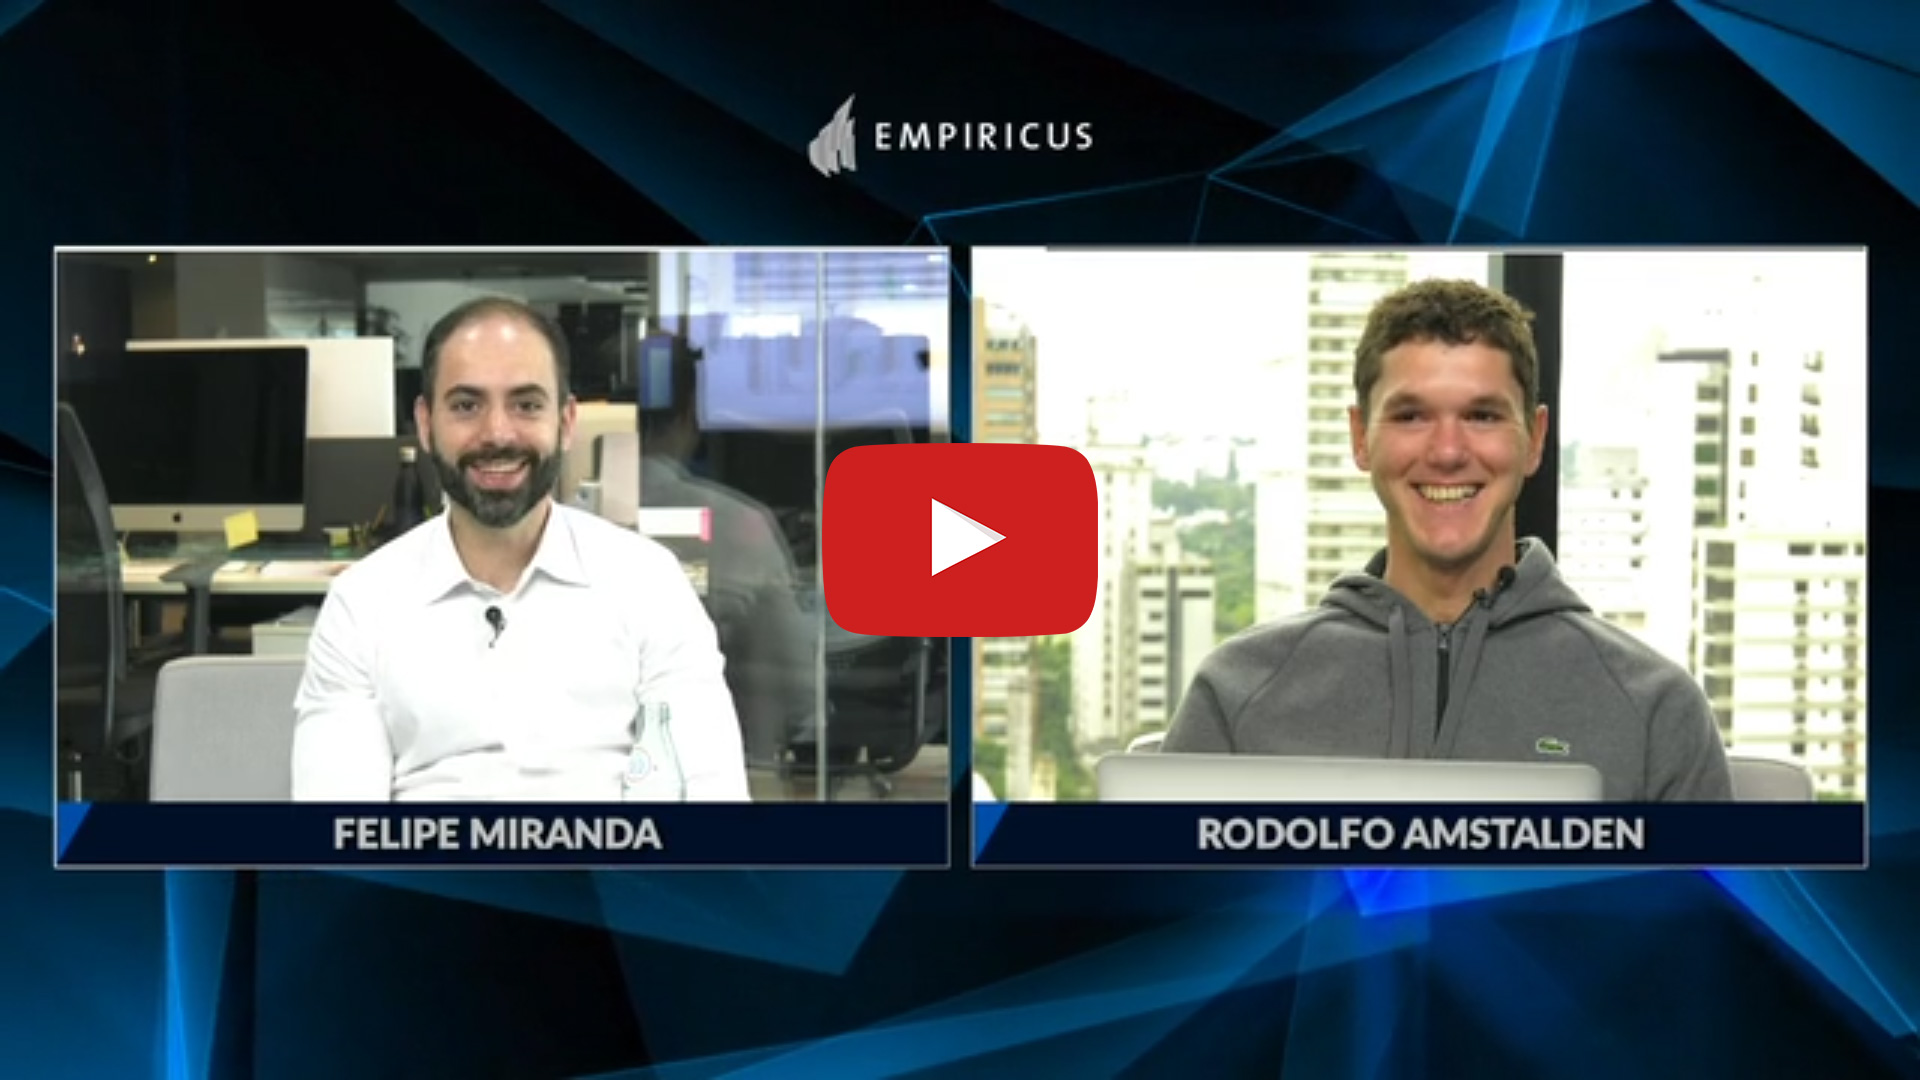 Felipe Miranda e Rodolfo Amstalden